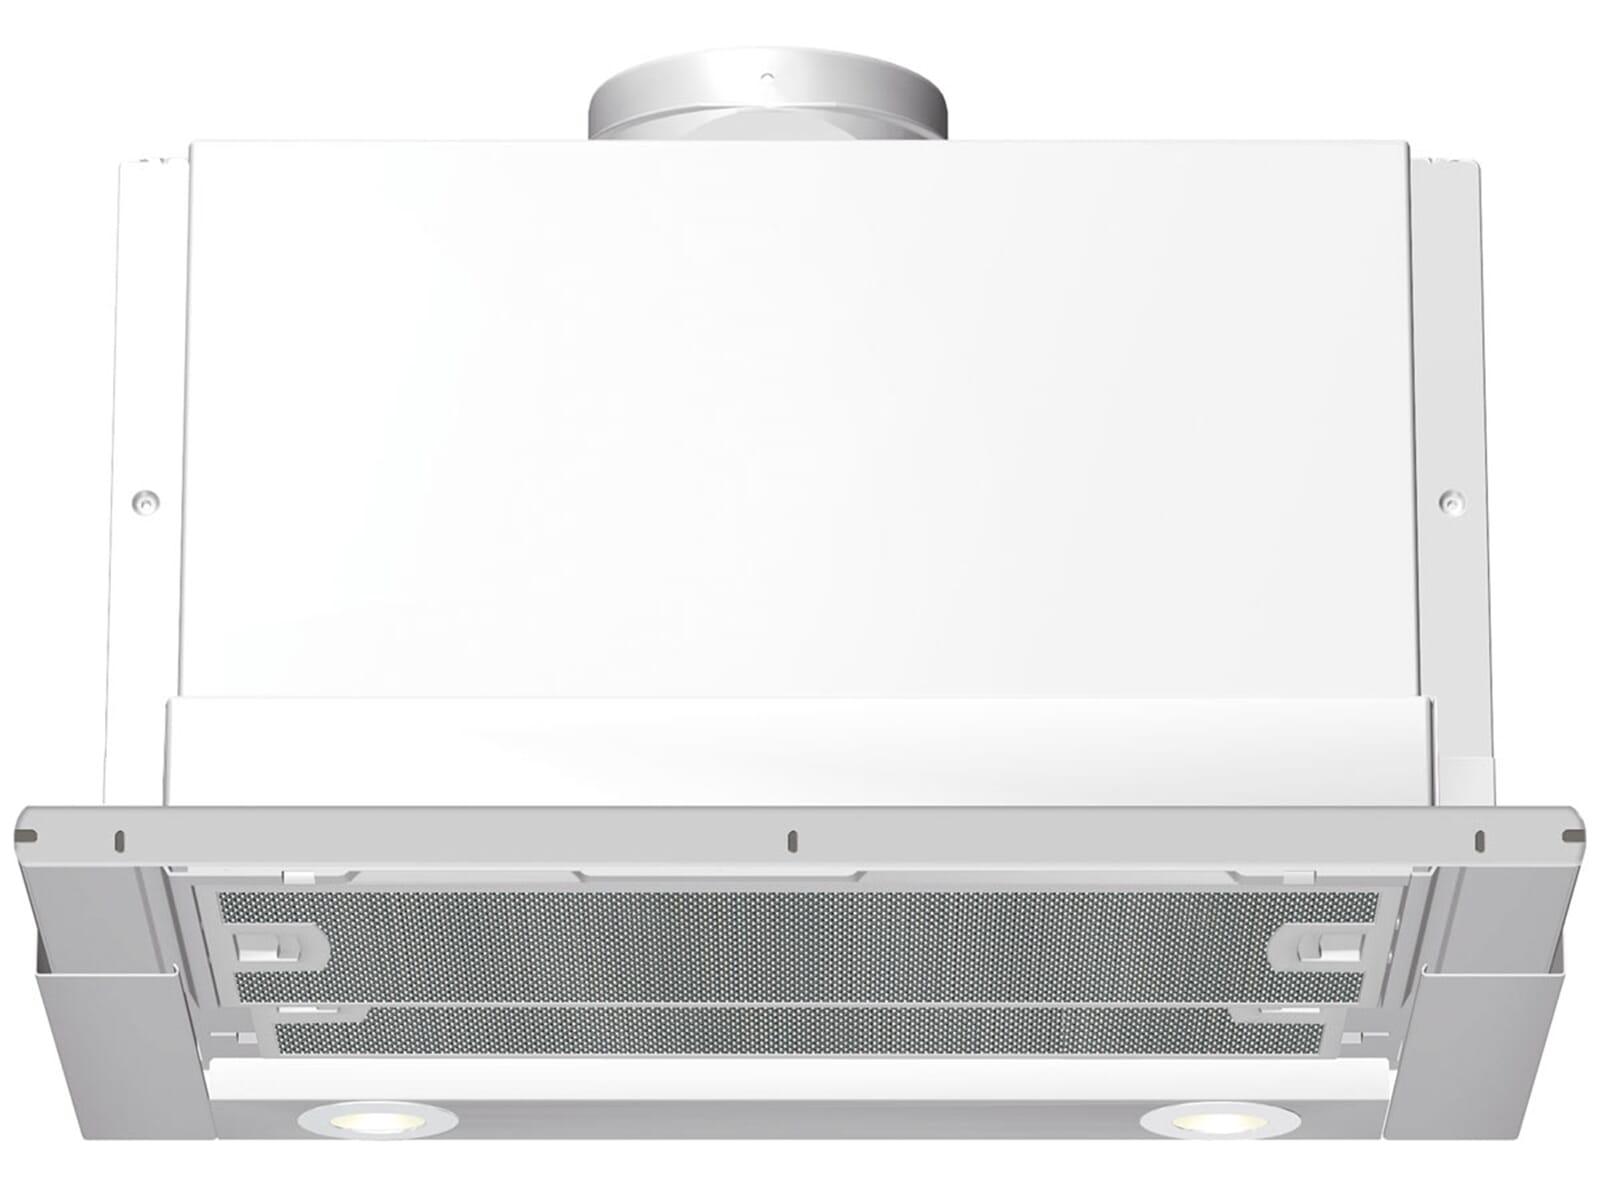 Aeg Einbau-Flachschirm-Dunstabzugshaube 710 D/760 D 2021